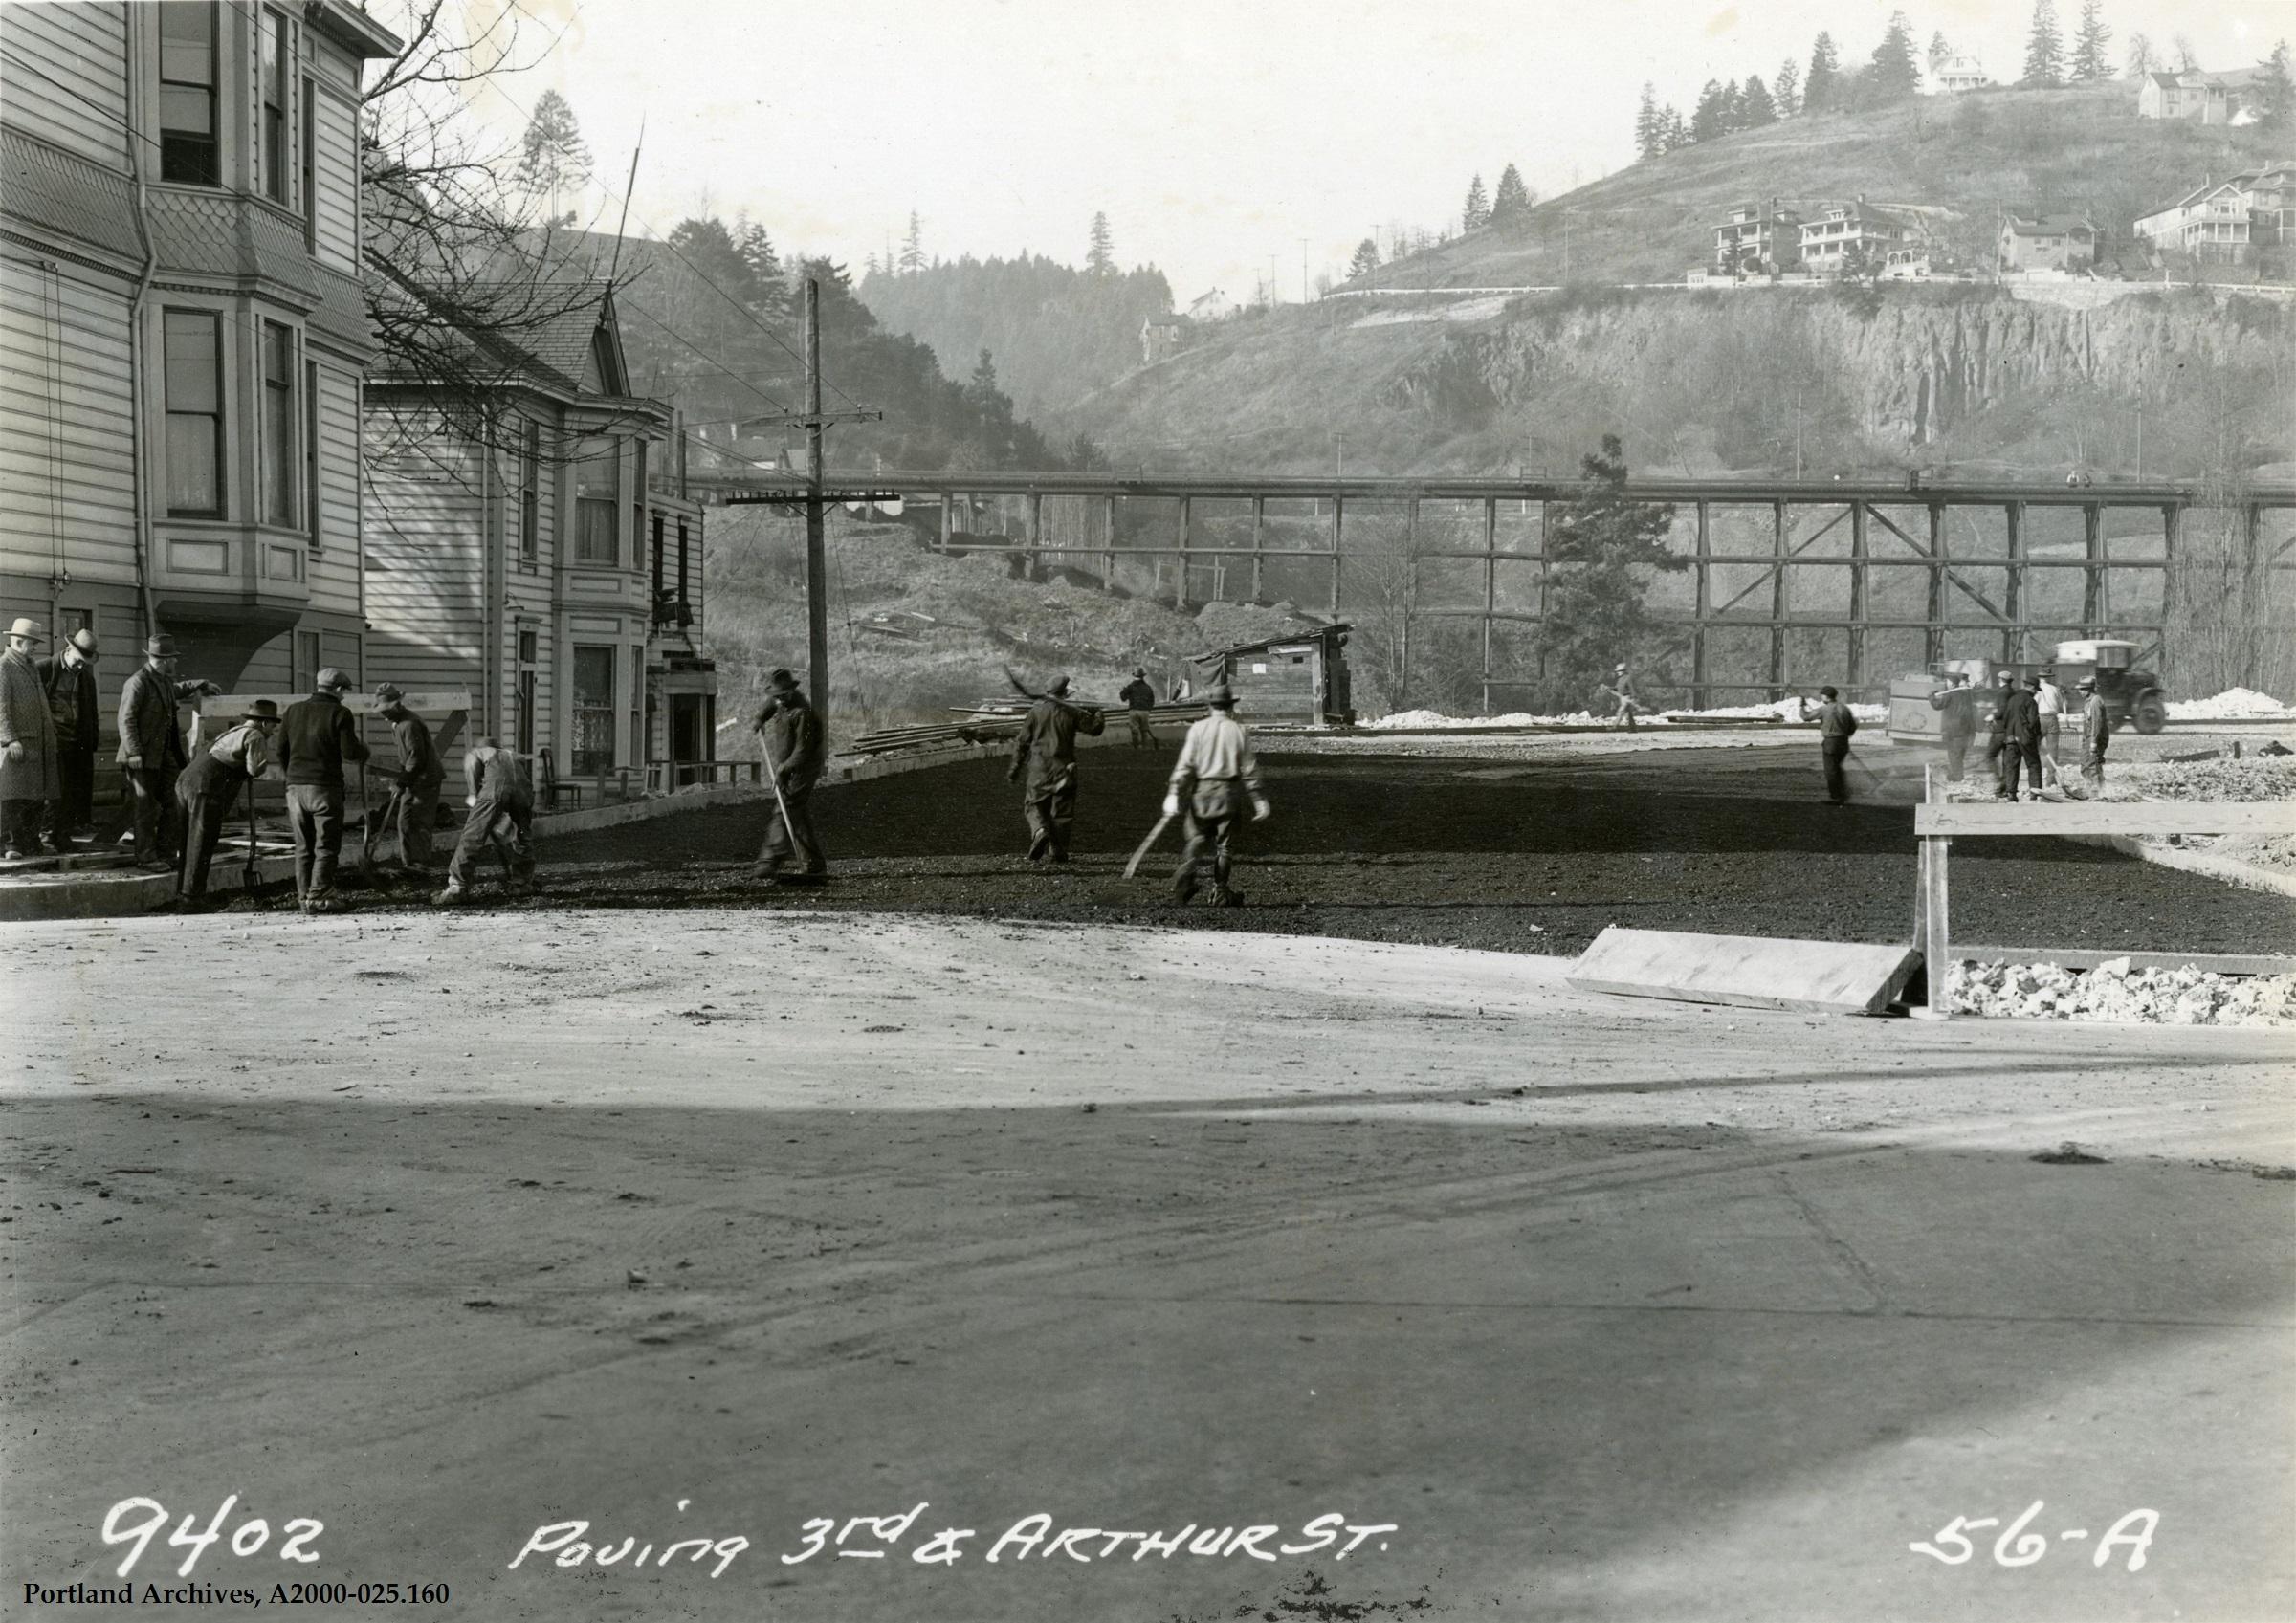 City of Portland Archives, Oregon, A2000-025.160